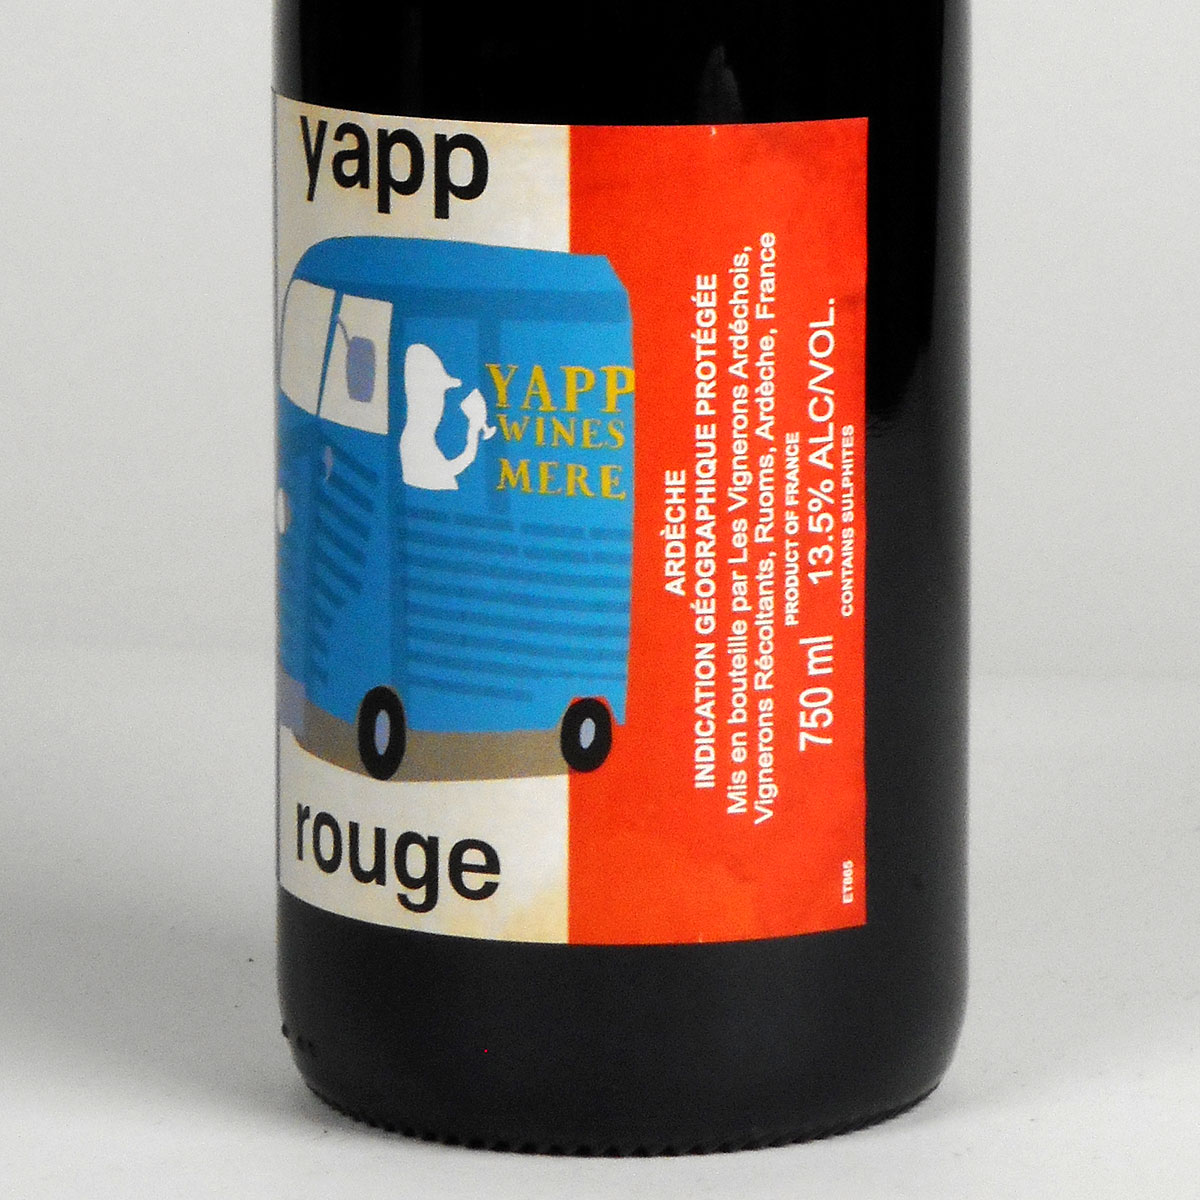 Yapp 'Own Label' Rouge 2018 - Bottle Side Label